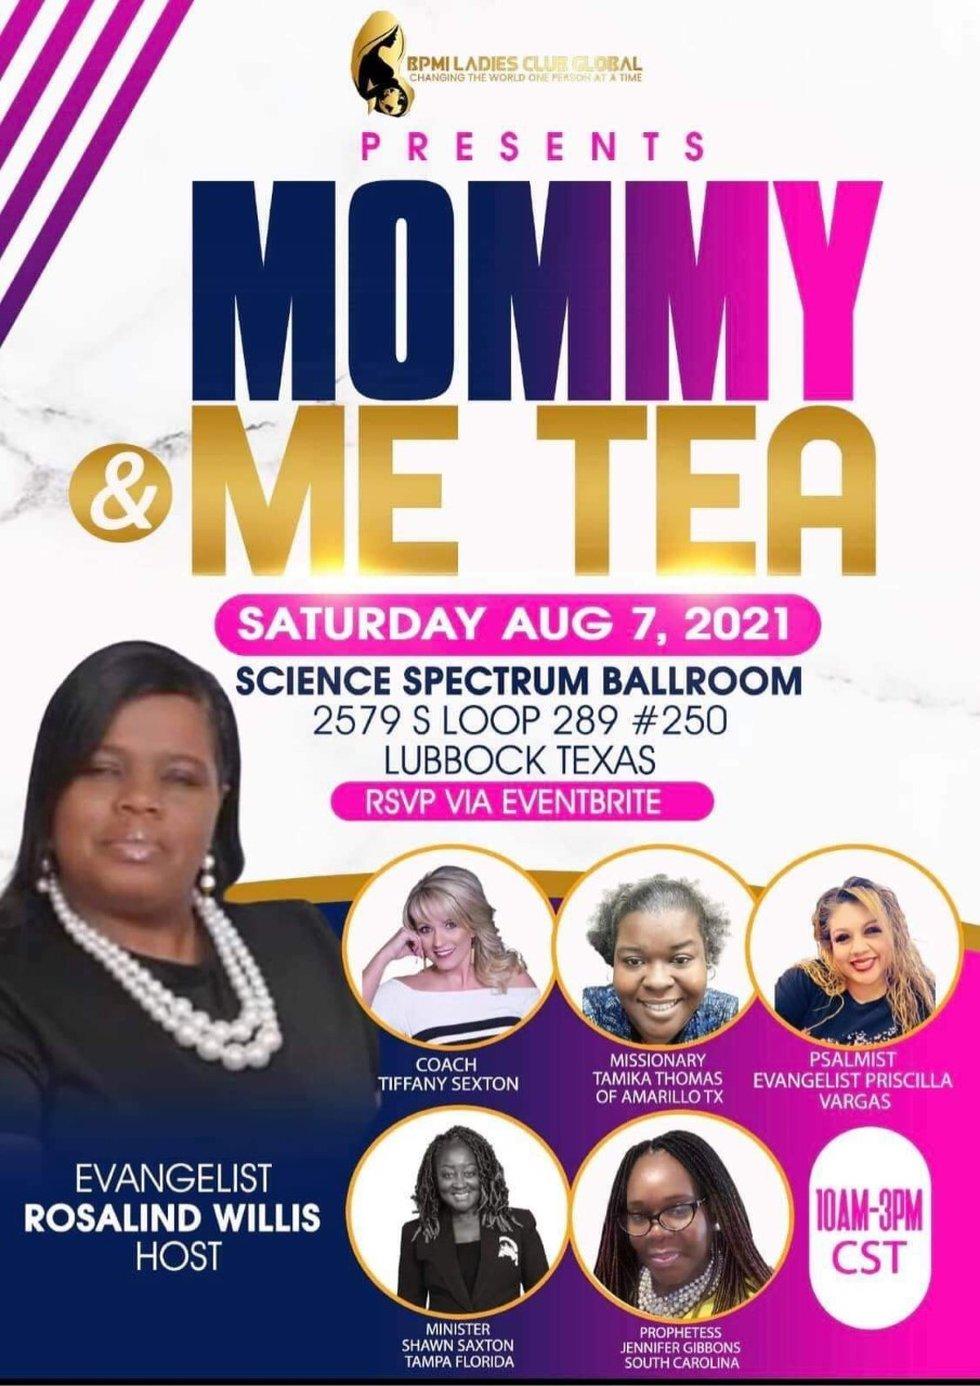 Mommy & Me Tea Saturday, August 7